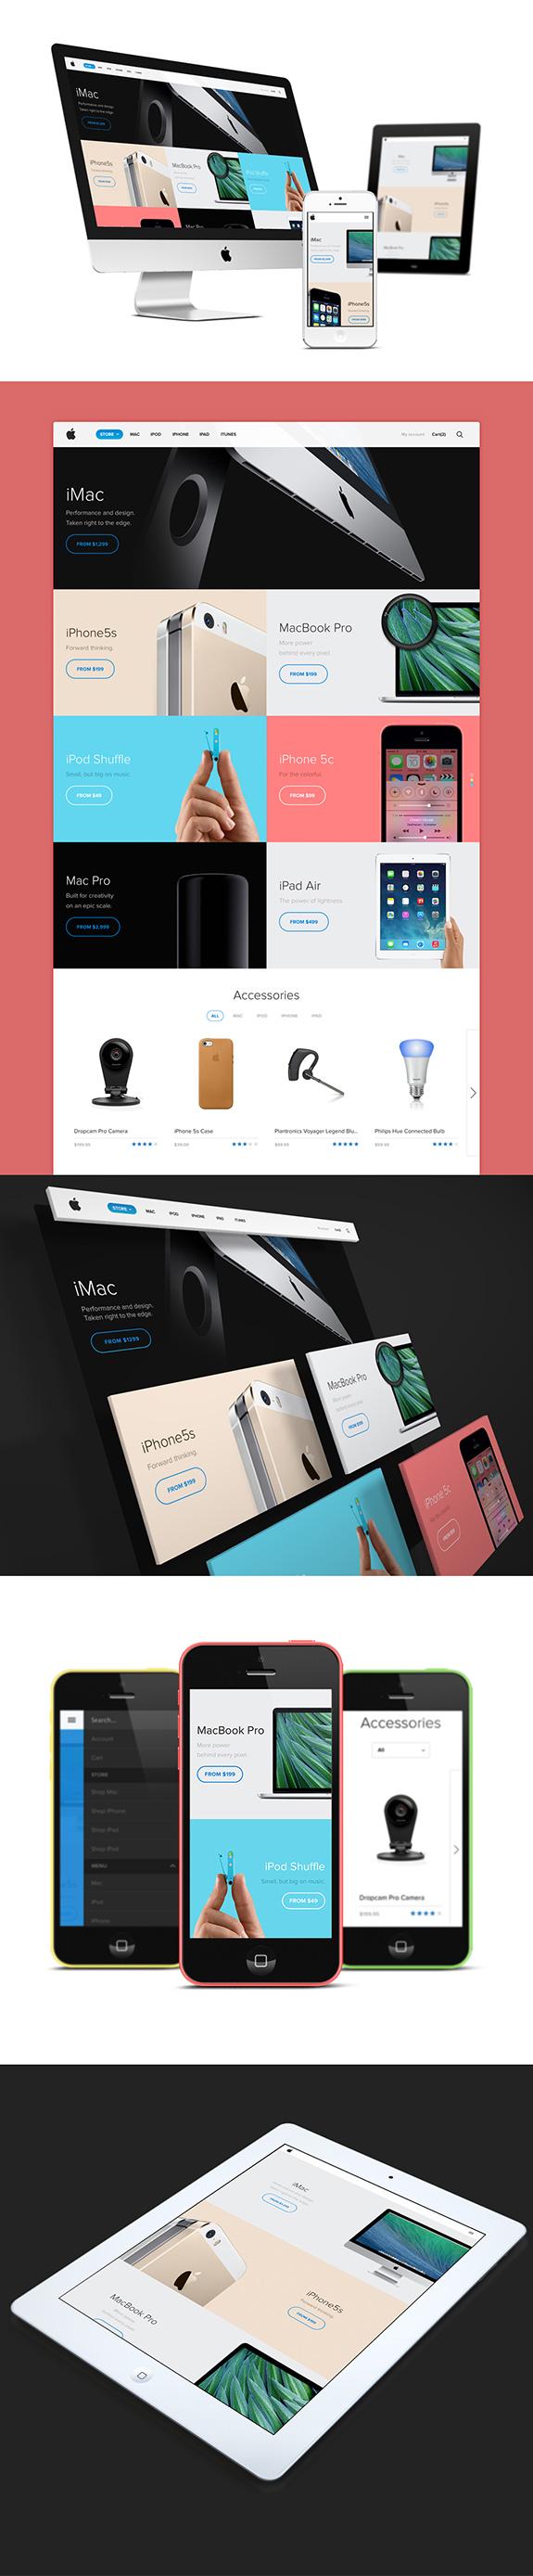 redesign